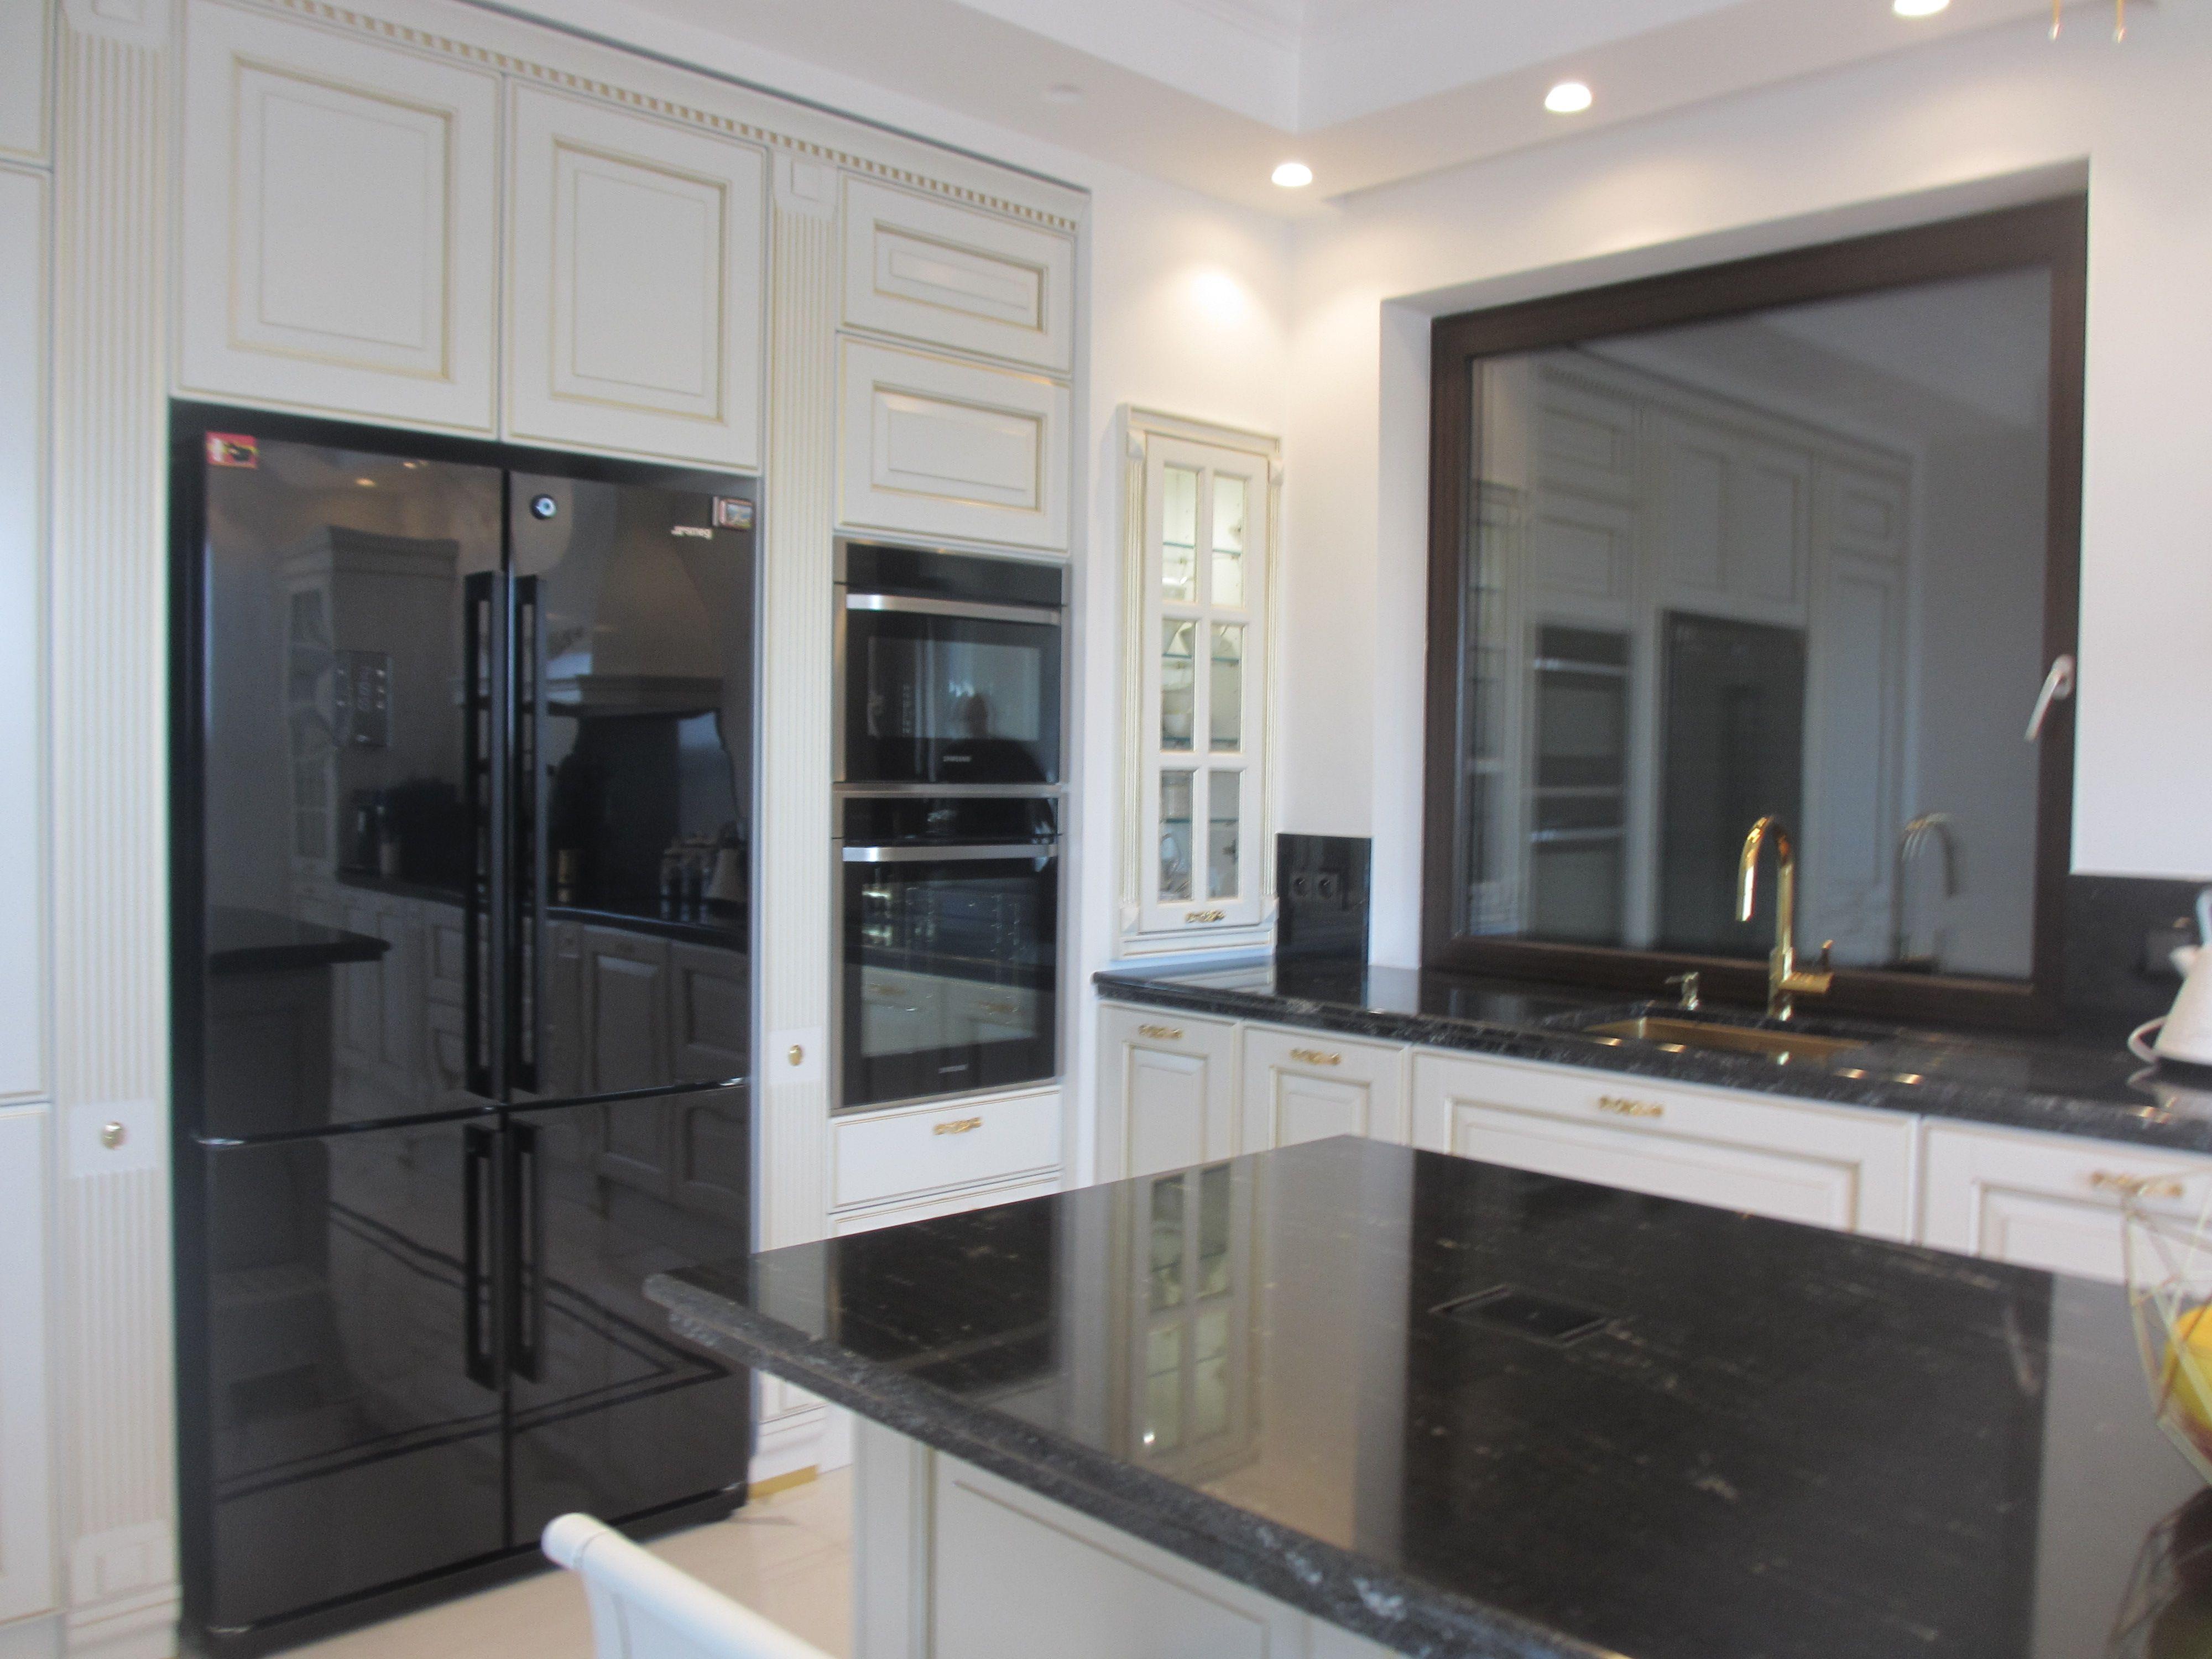 Bialo Czarna Kuchnia Klasyczna Styl Angielski Kitchen Appliances Kitchen Cabinets Home Decor